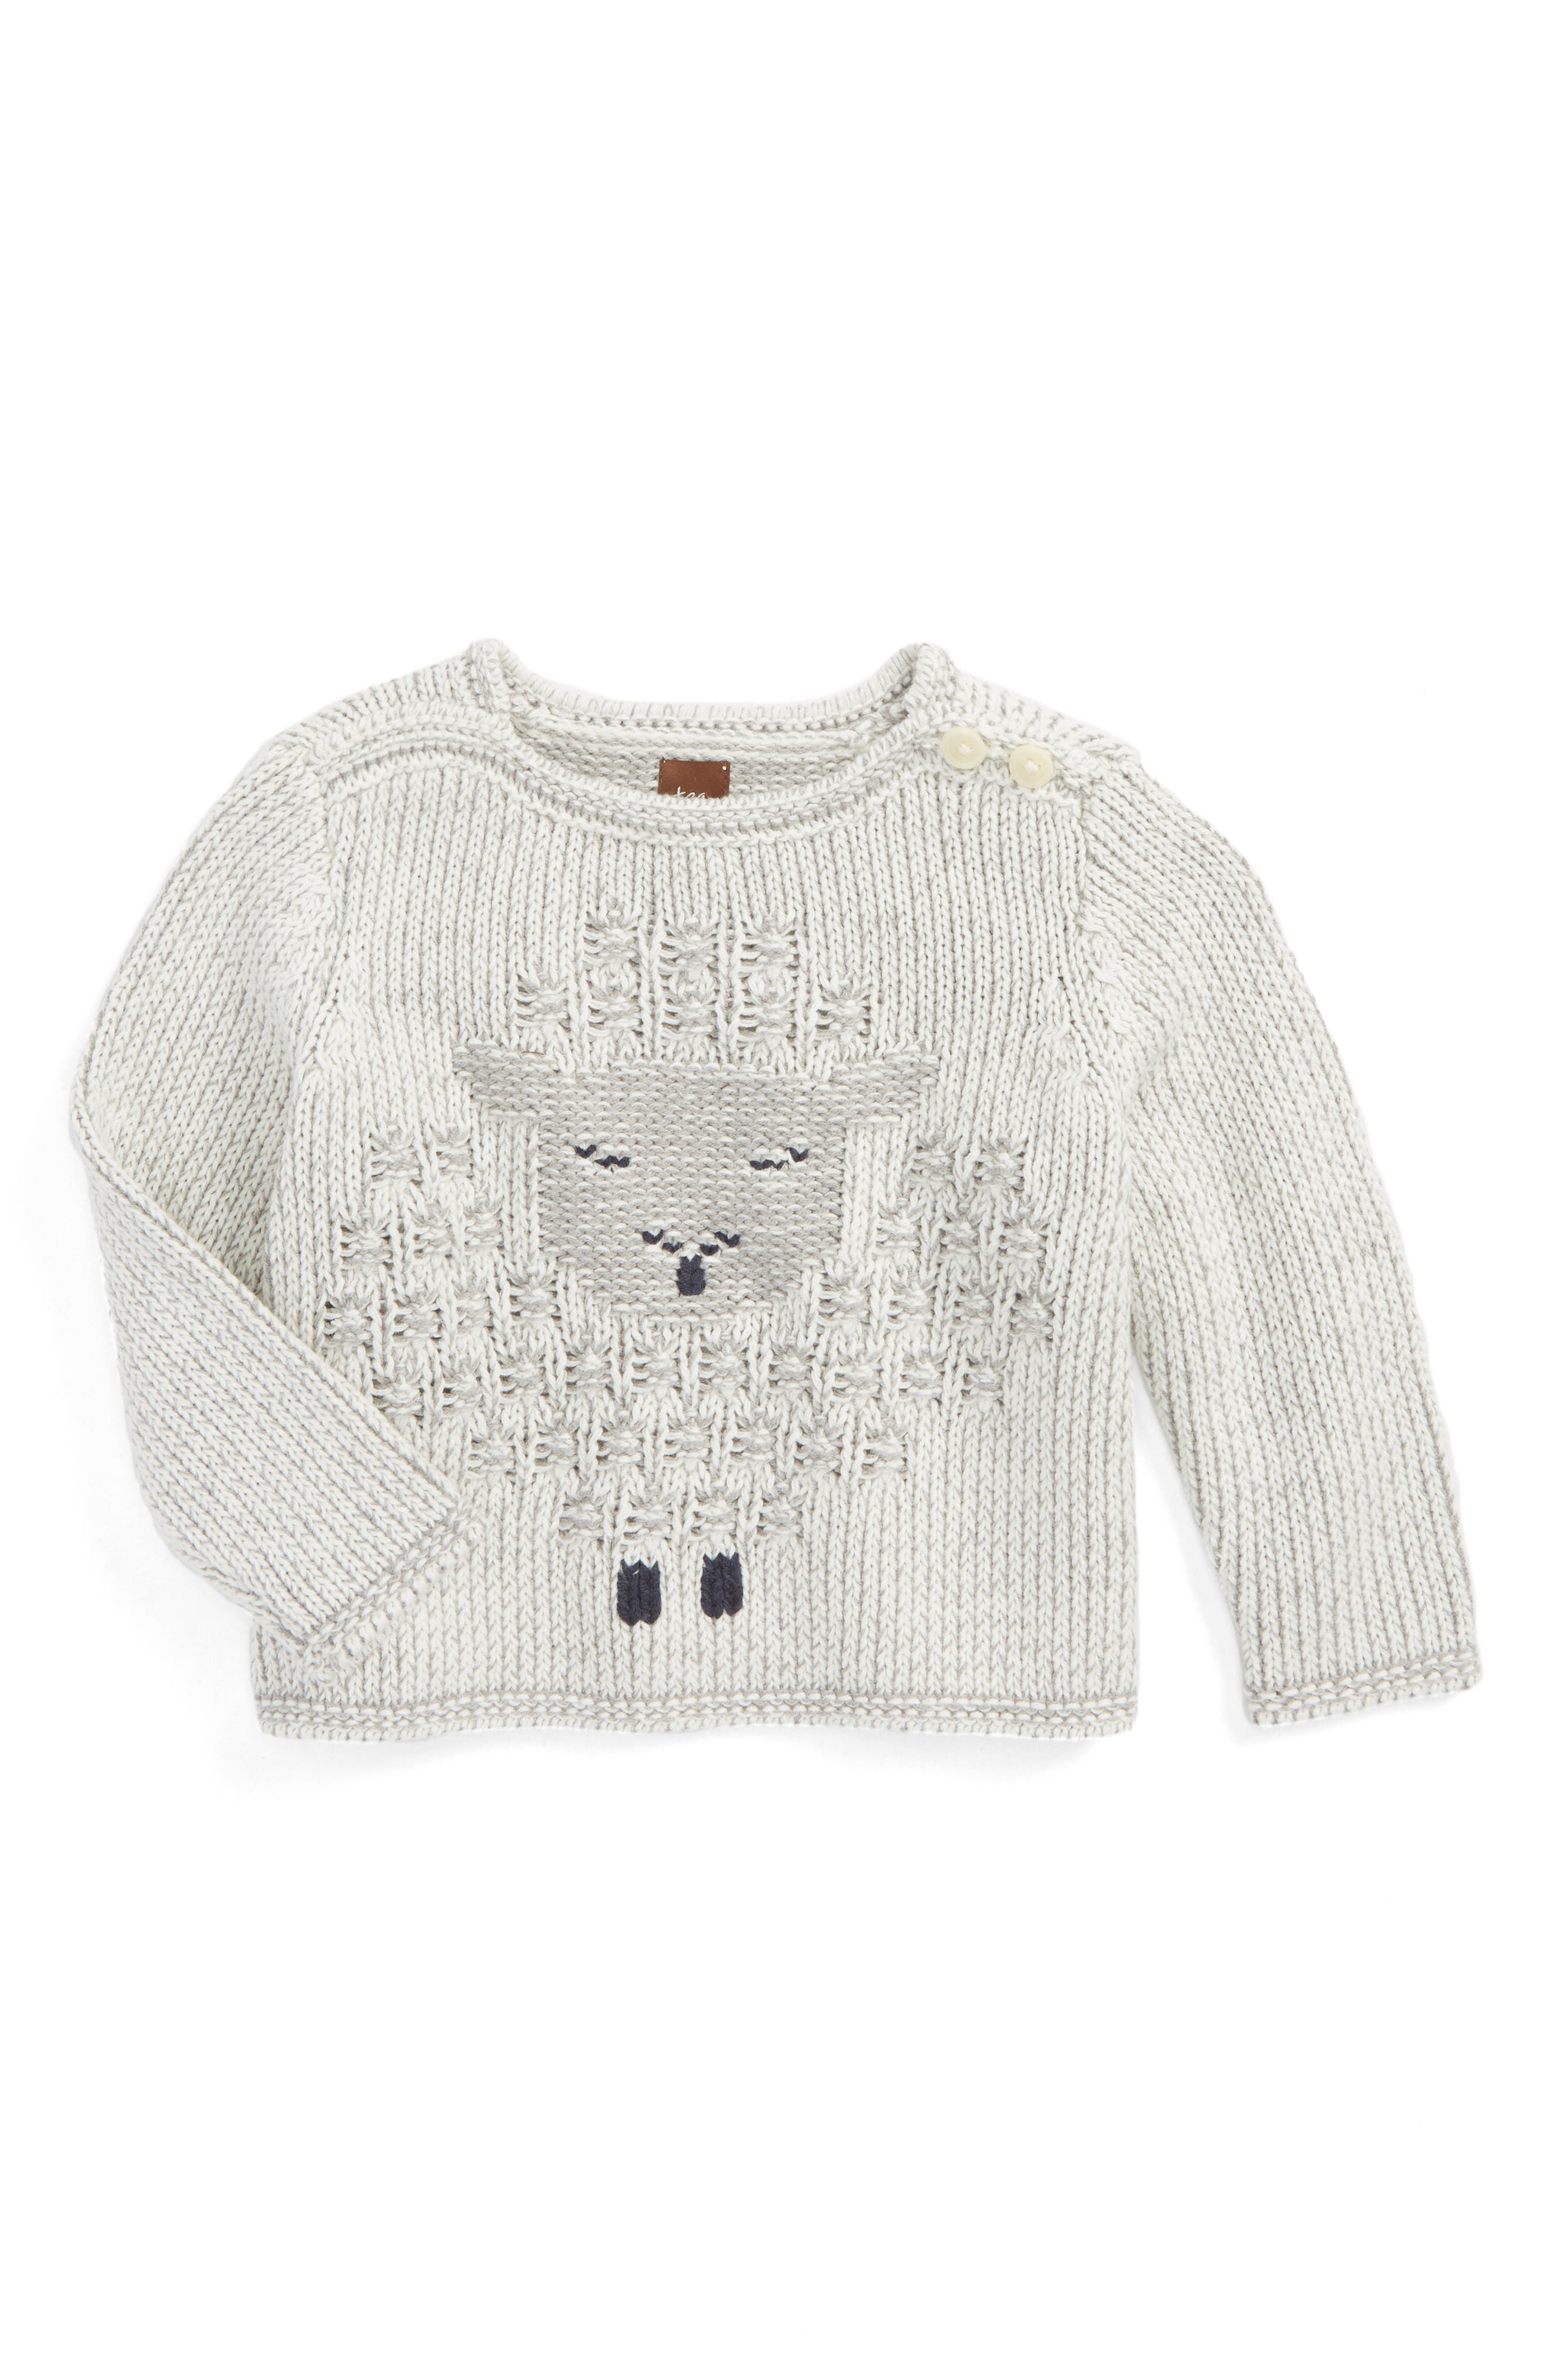 Main Image - Tea Collection Uan Sweater (Toddler Girls)